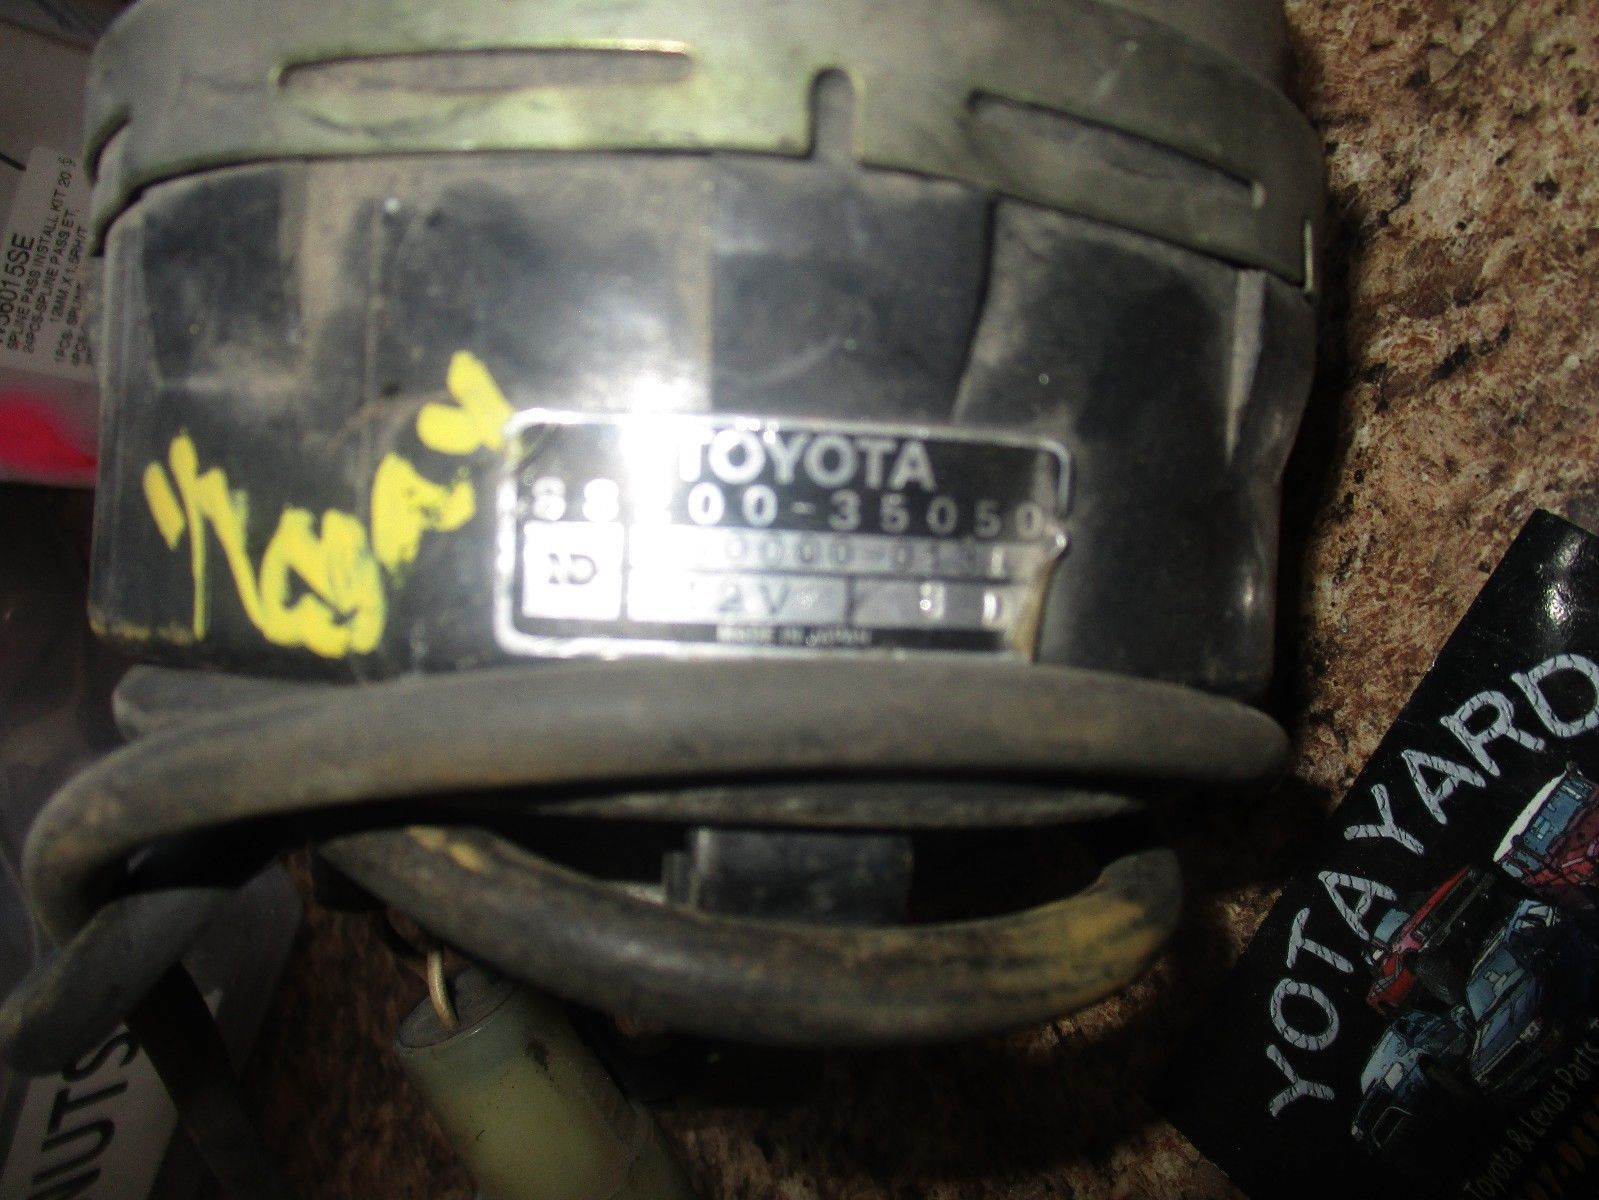 Toyota 88212-35080 Cruise Control Actuator Cover